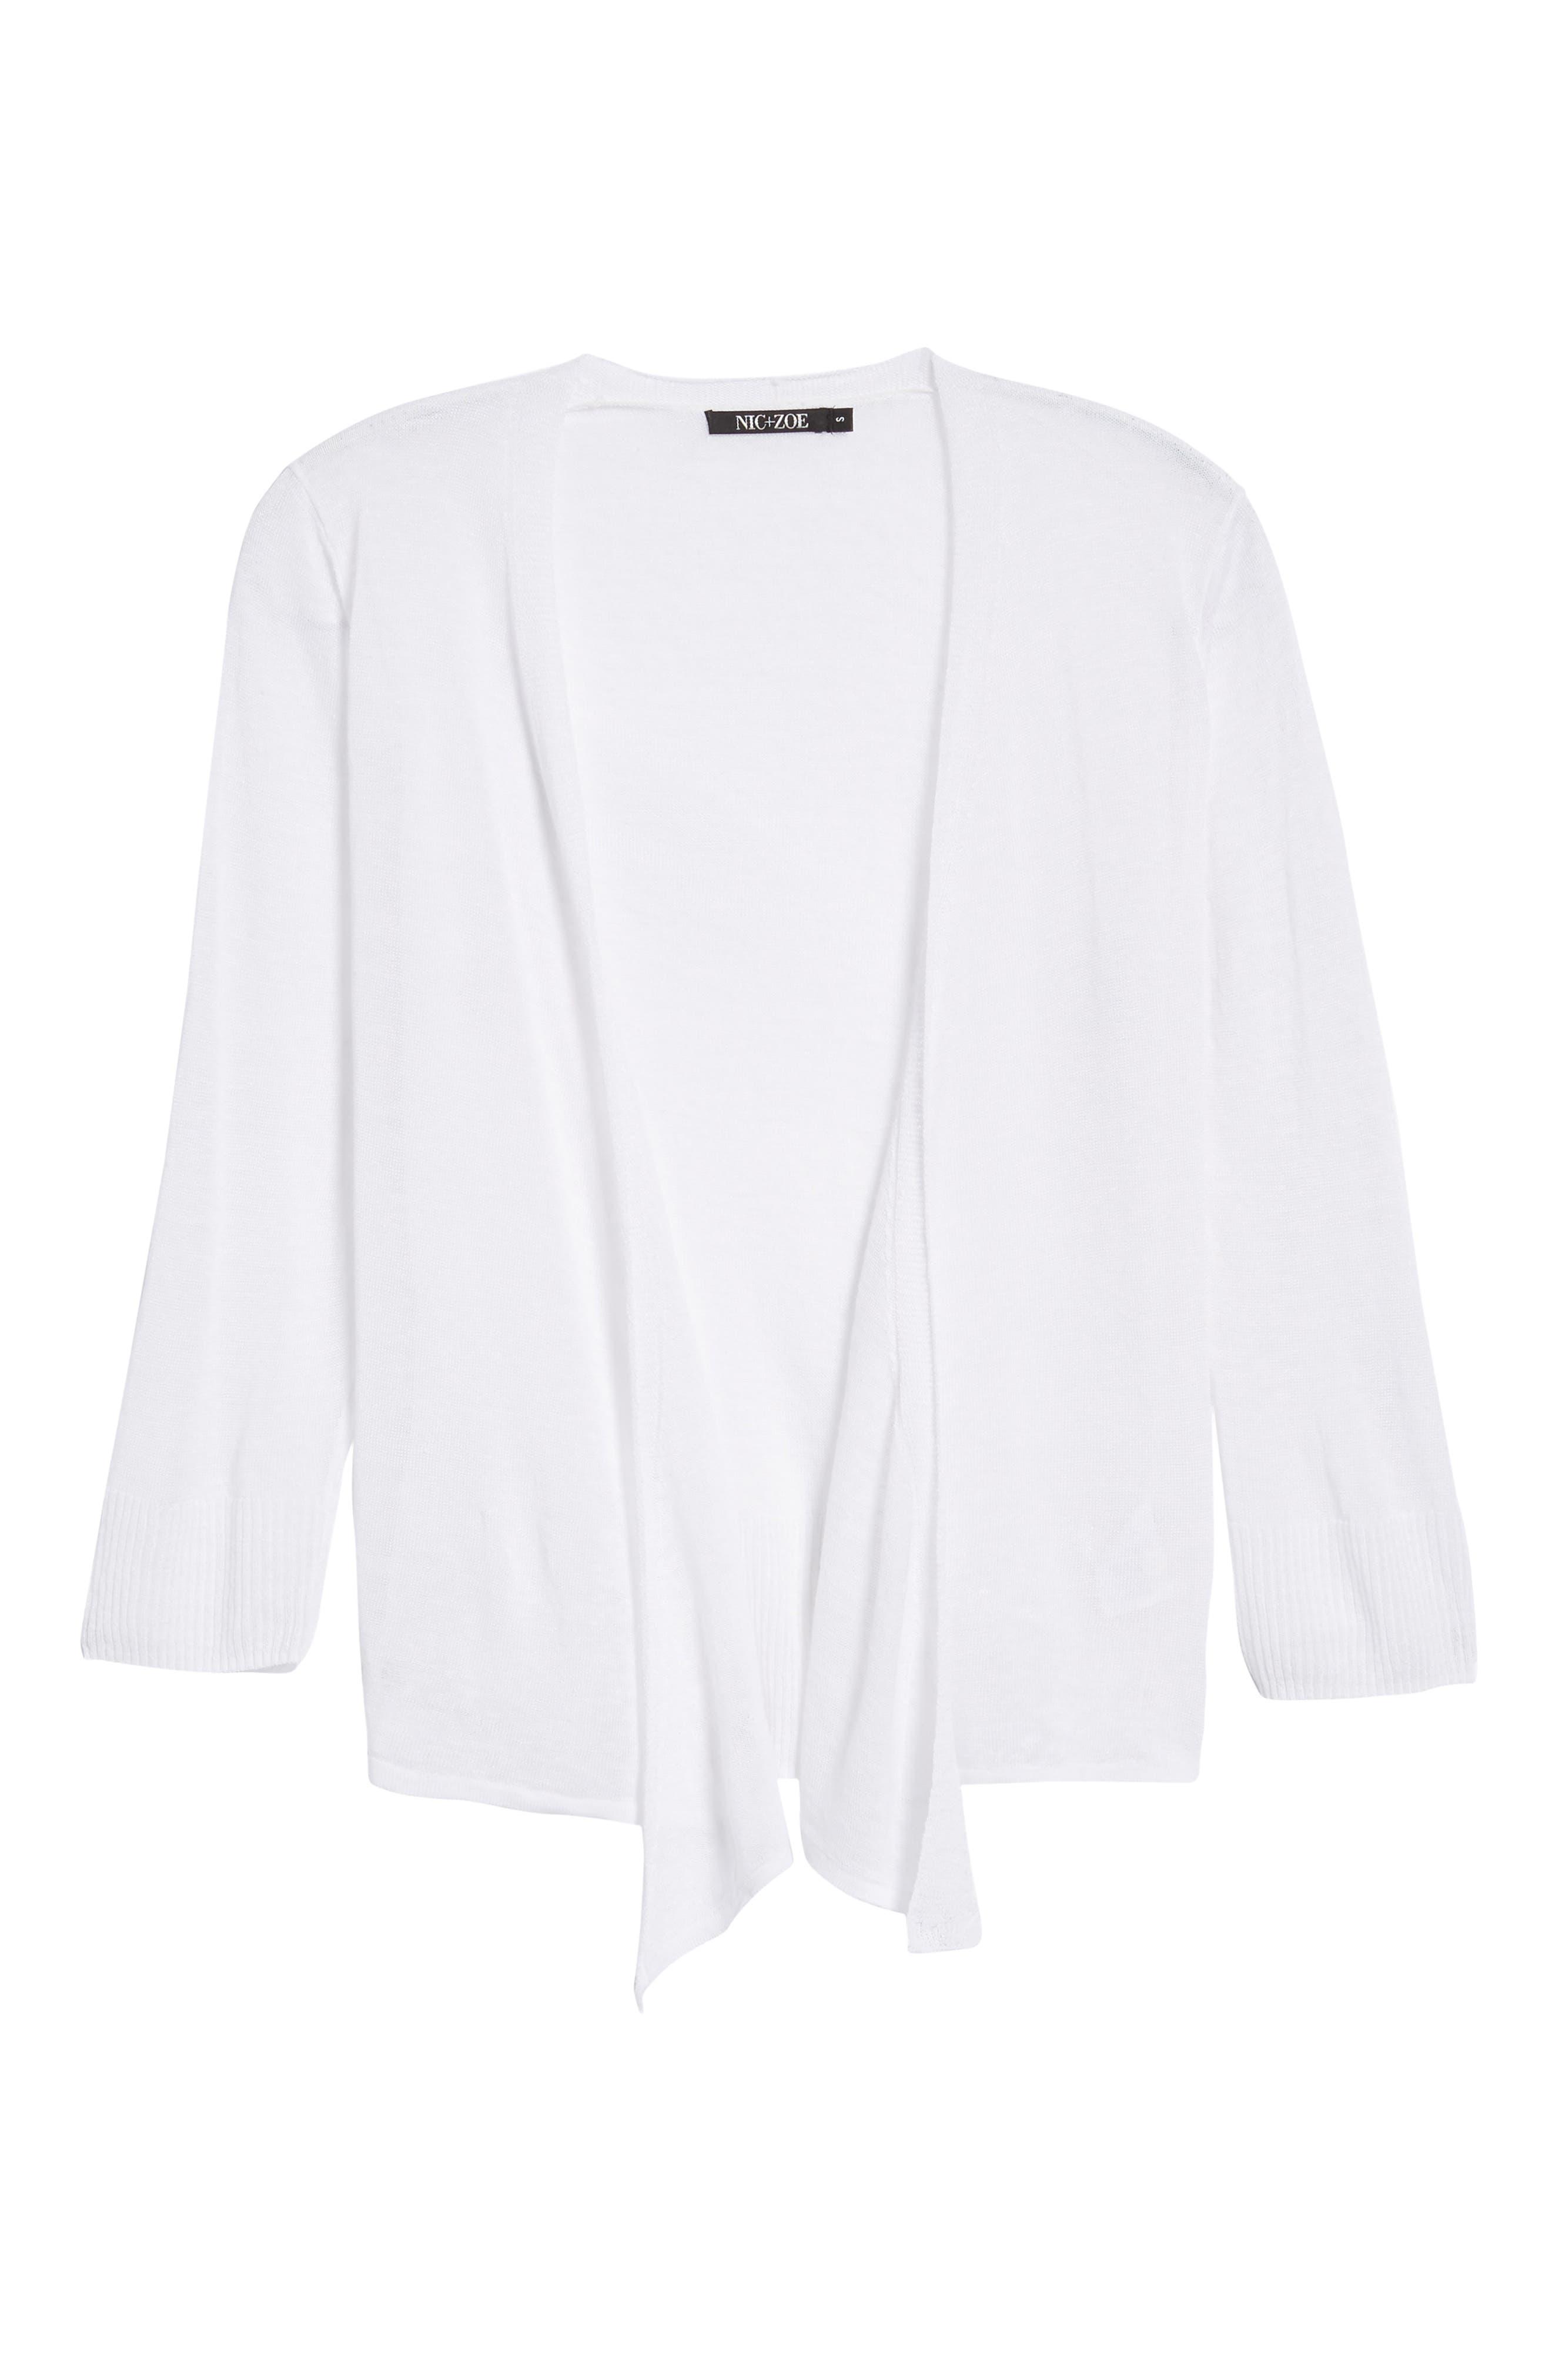 4-Way Convertible Three Quarter Sleeve Cardigan,                             Main thumbnail 1, color,                             Paper White